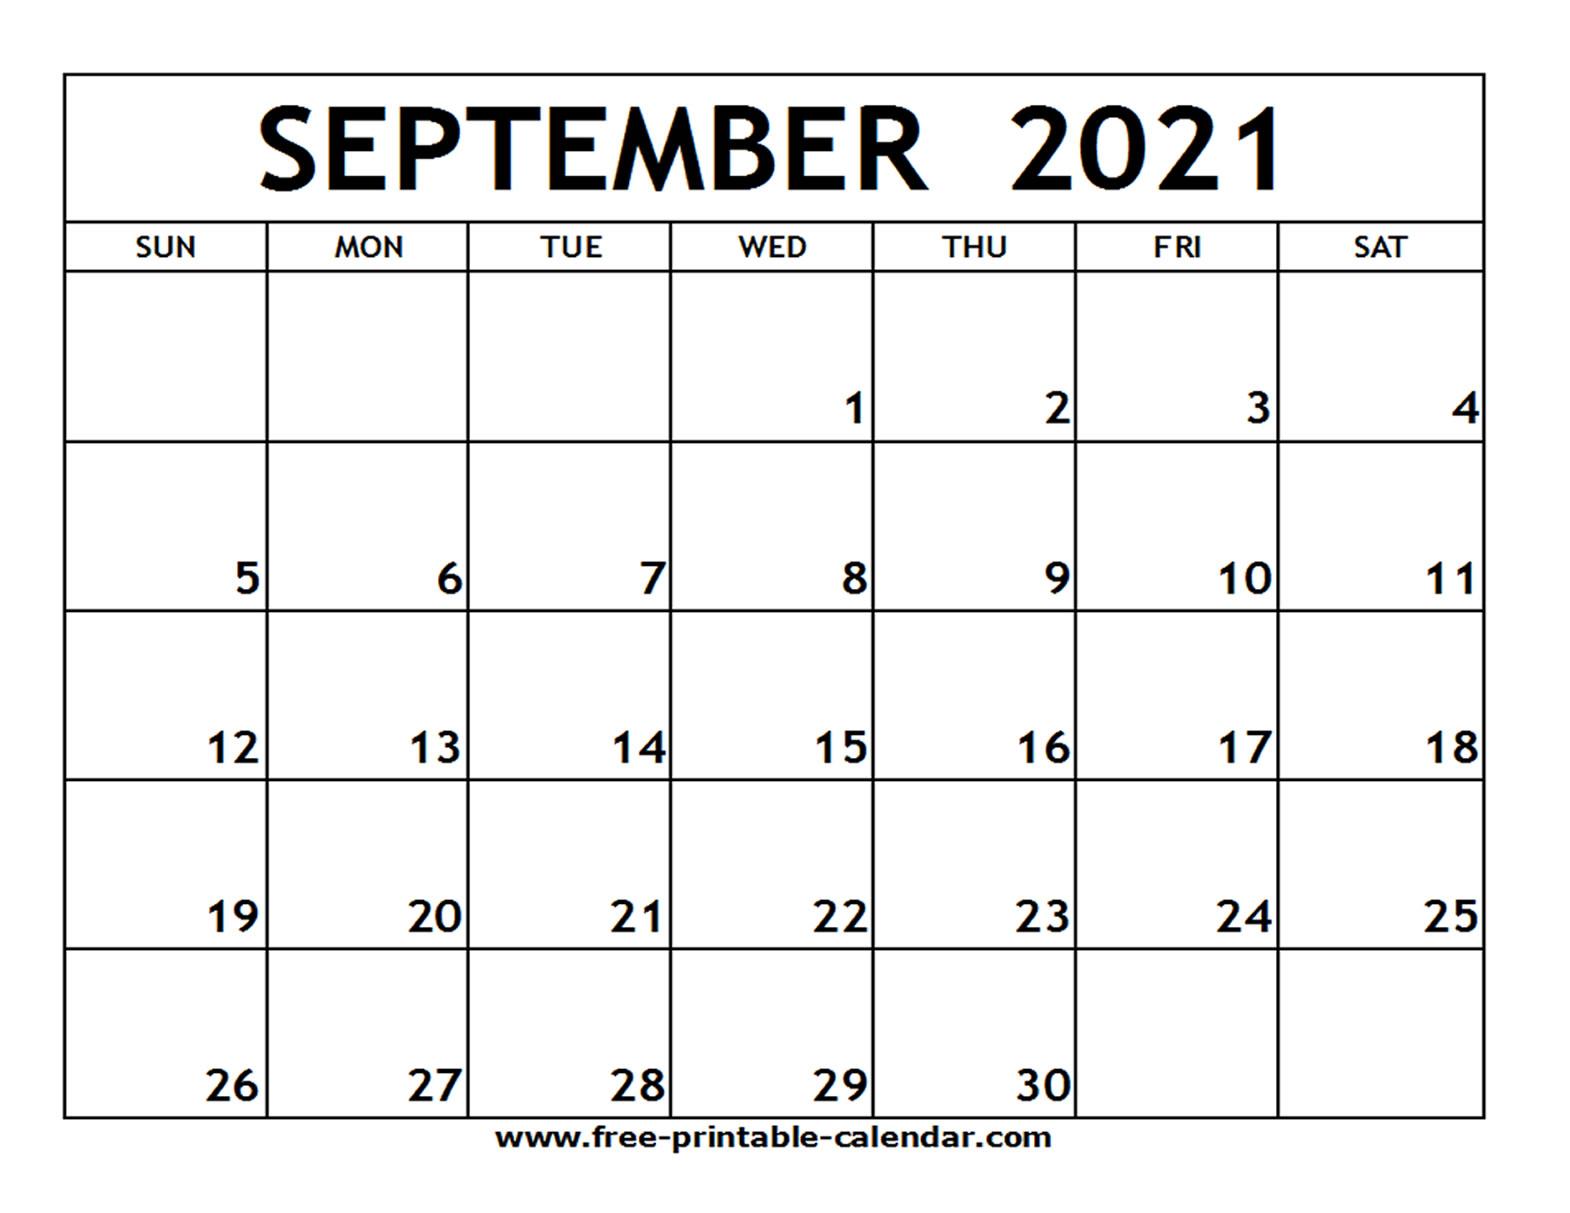 September 2021 Printable Calendar - Free-Printable-Calendar with regard to September 2021 Calendar Printable